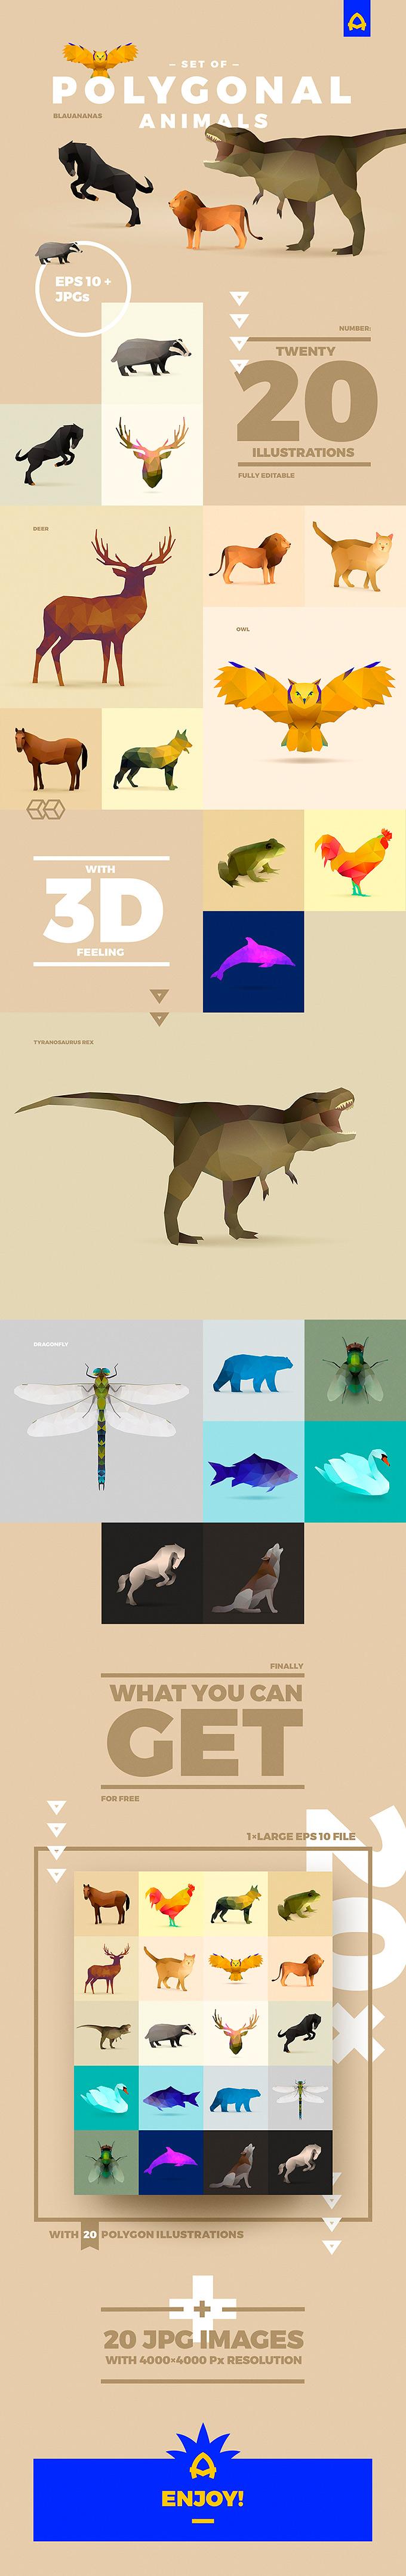 Free Polygonal Animals Set